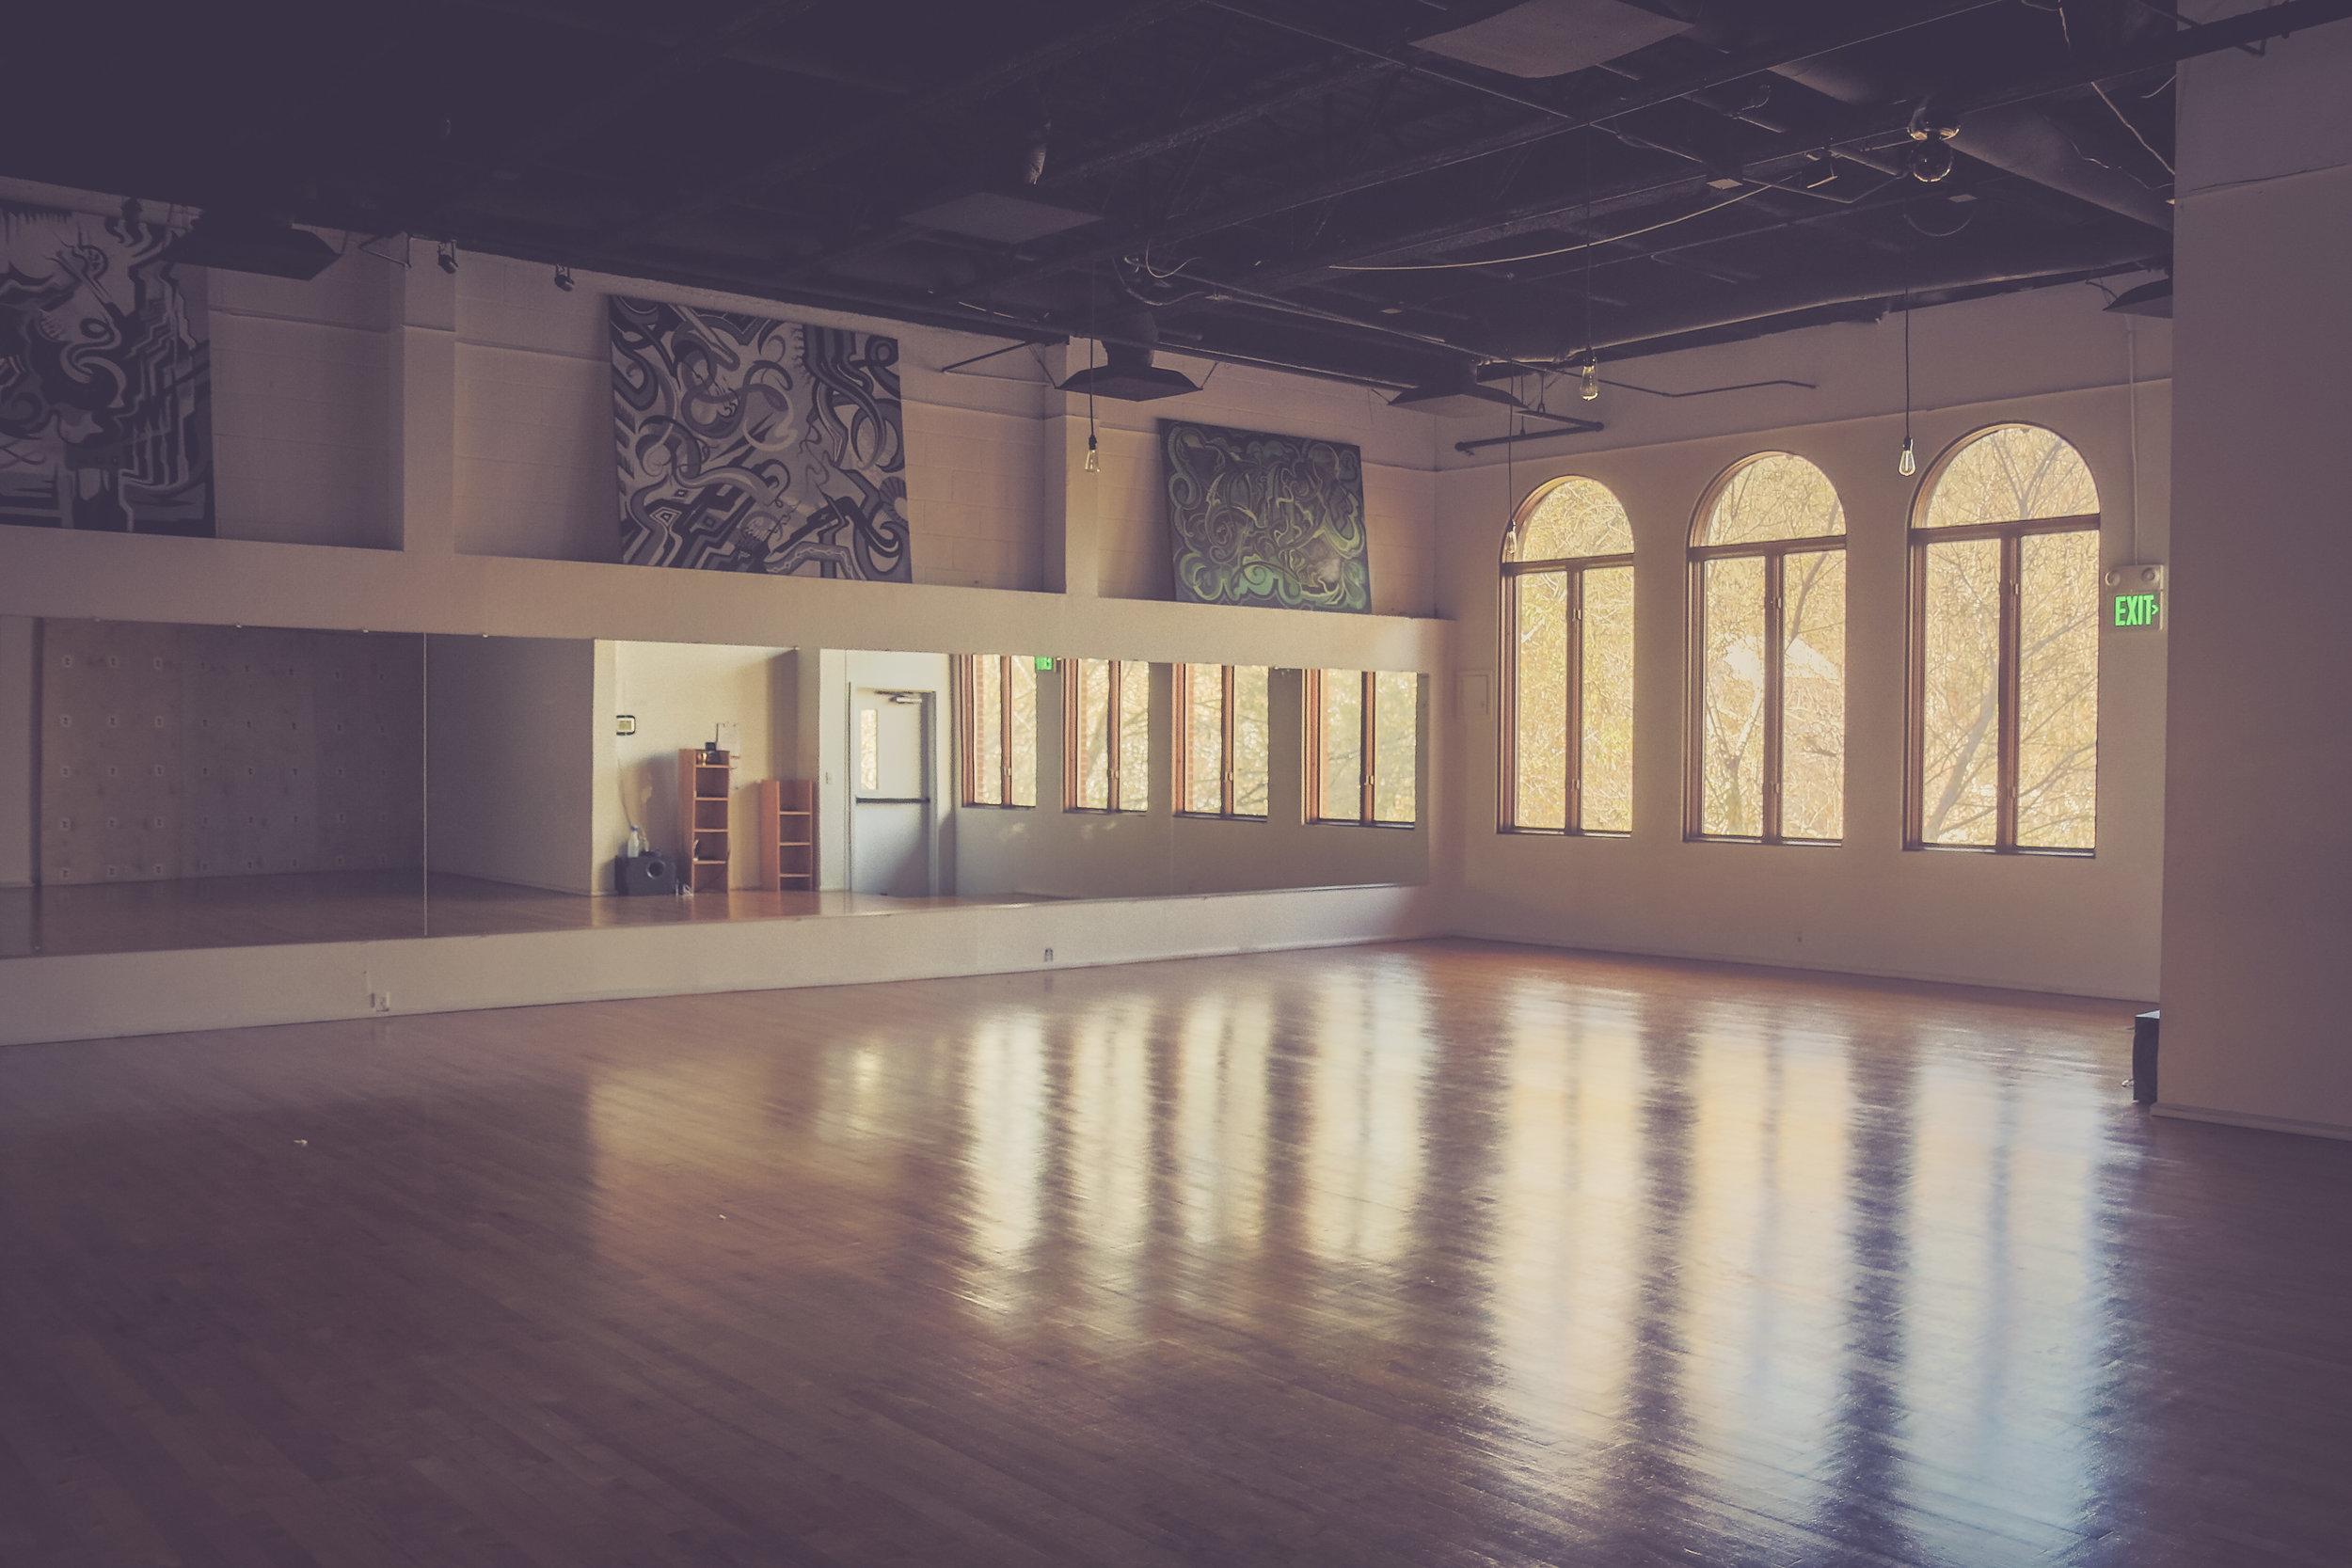 Yoga-centre-slo-150115-142.jpg